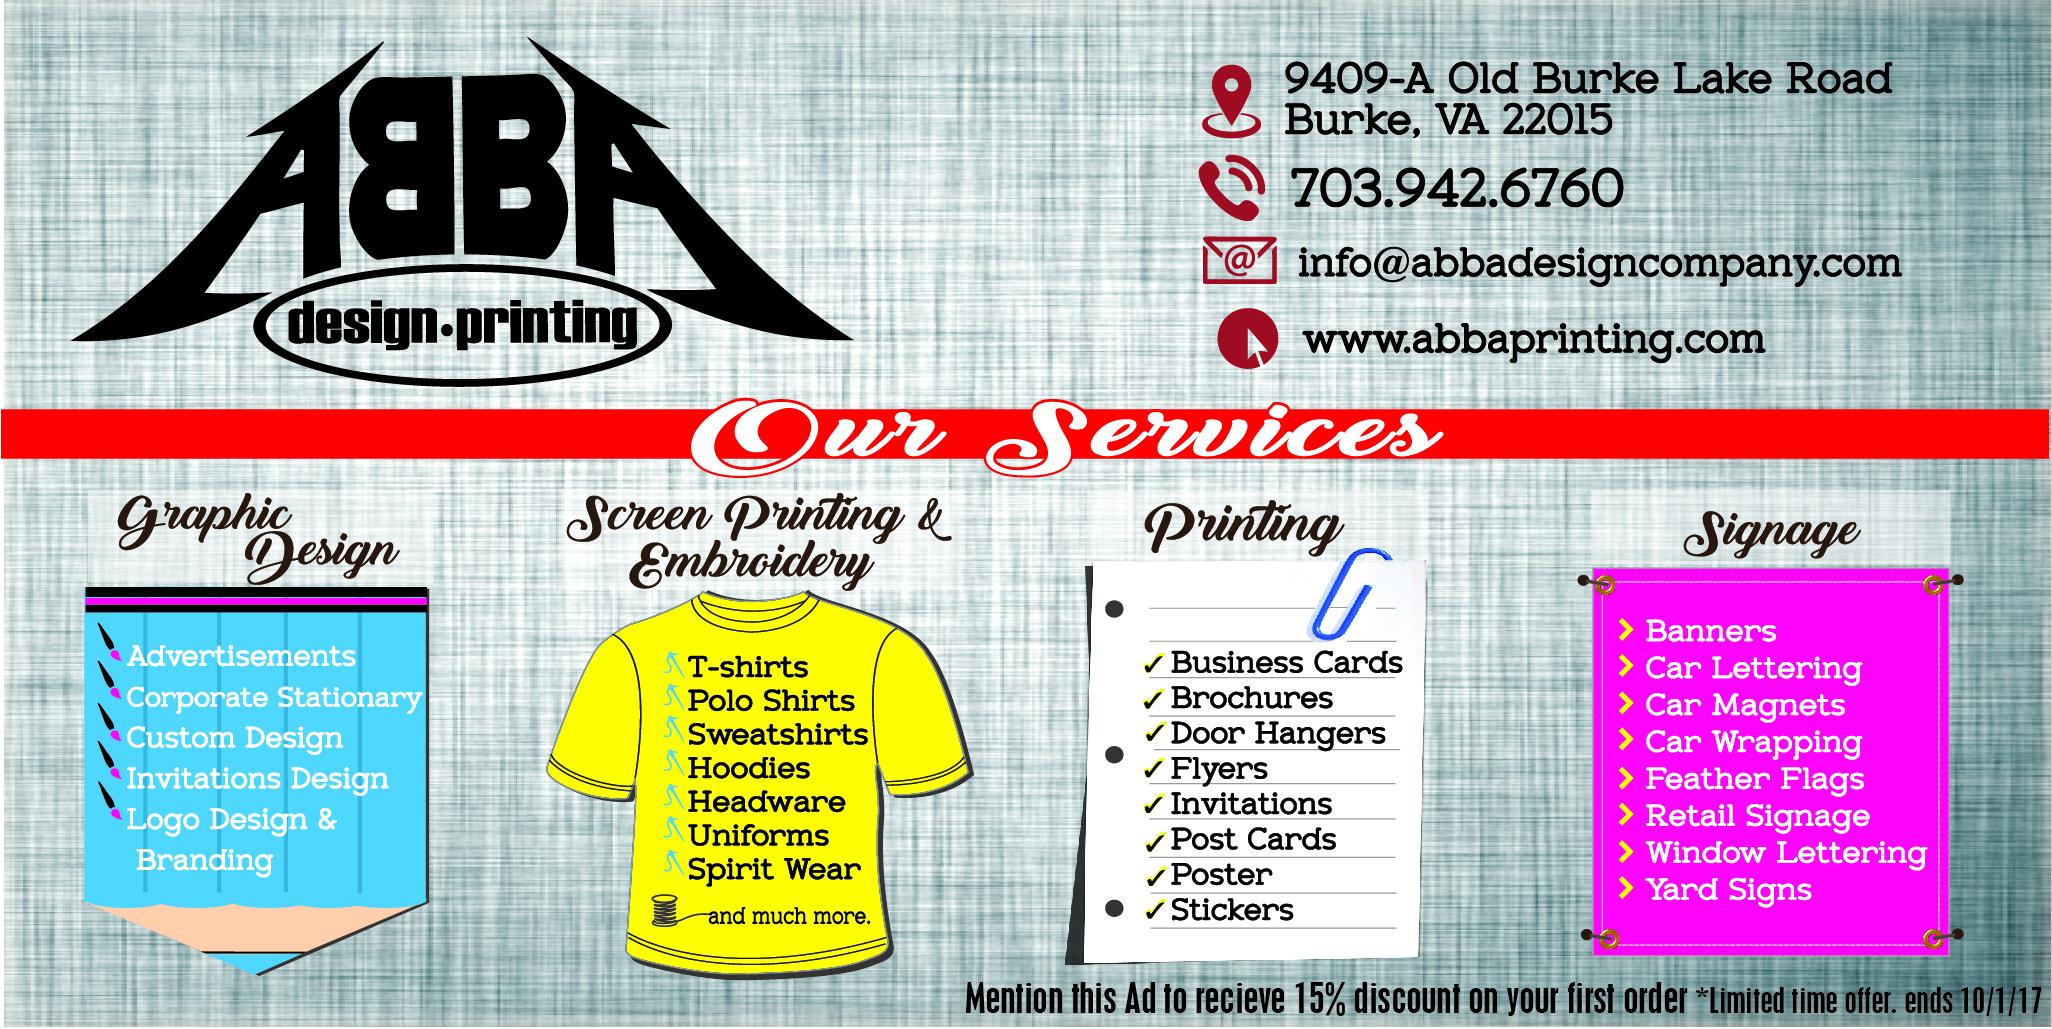 ABBA DESIGN, LLC | (703) 942-6760 | WWW.ABBAPRINTING.COM